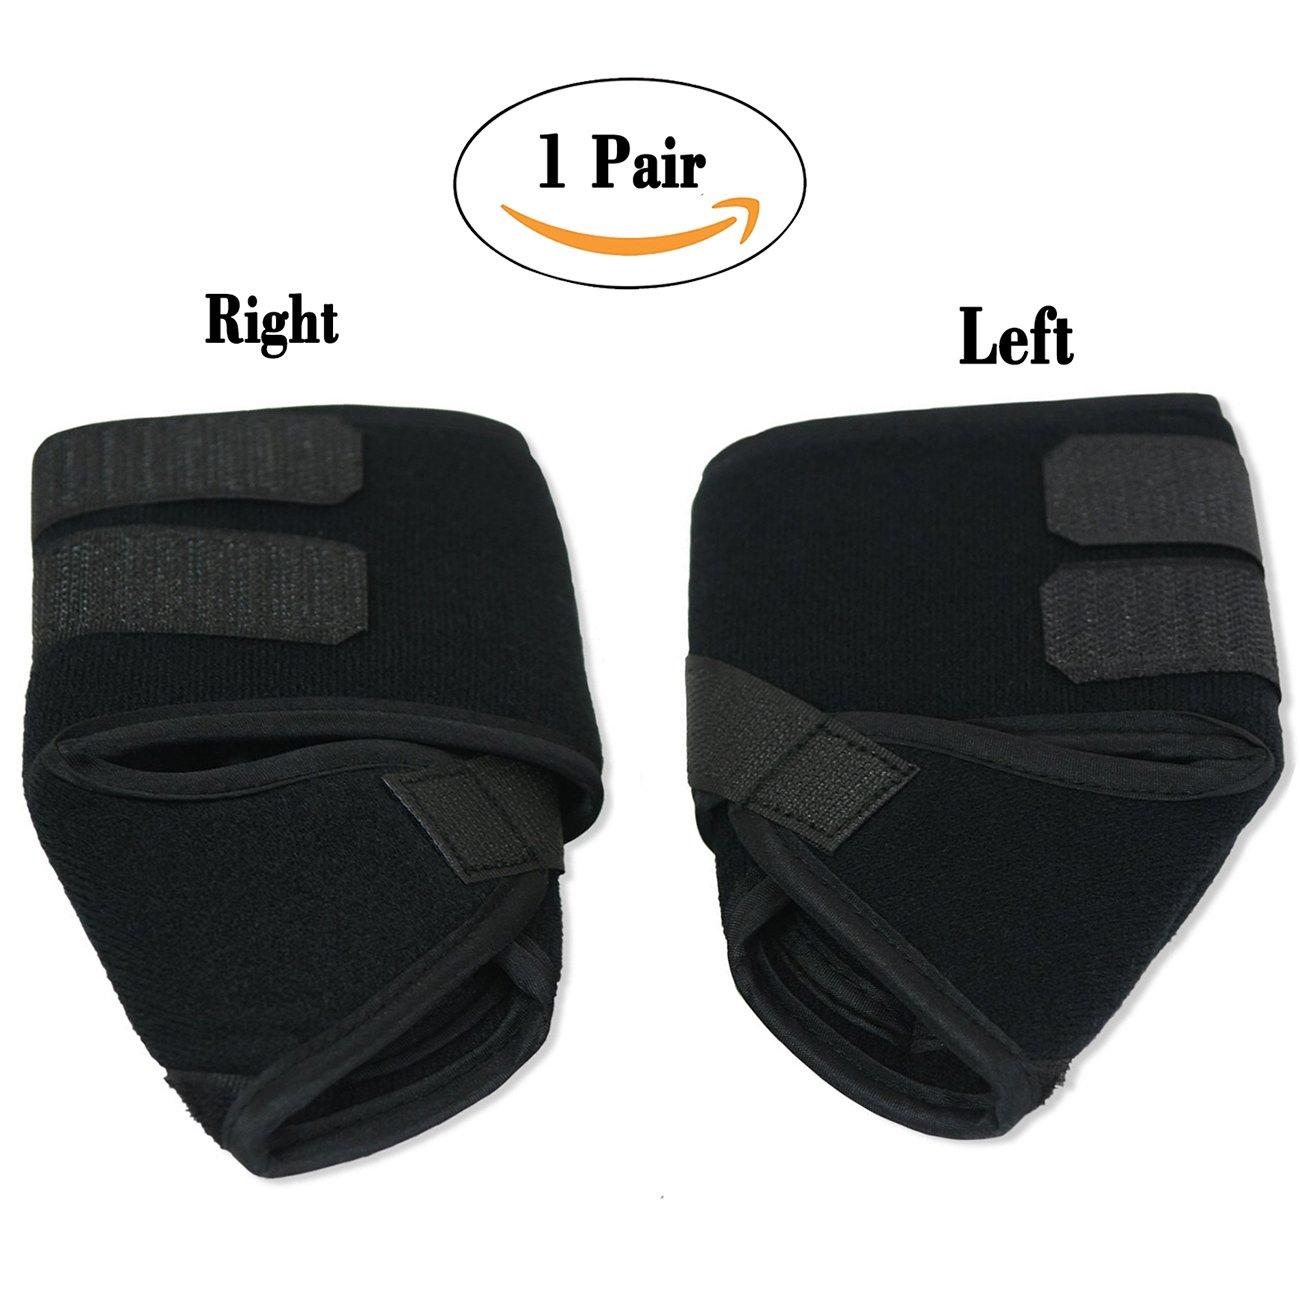 Dr. Kong 1 Pair Hallux Valgus Pain Relief Bunion Aid Corrector Arch Support Bunion Splints Toe Straightener